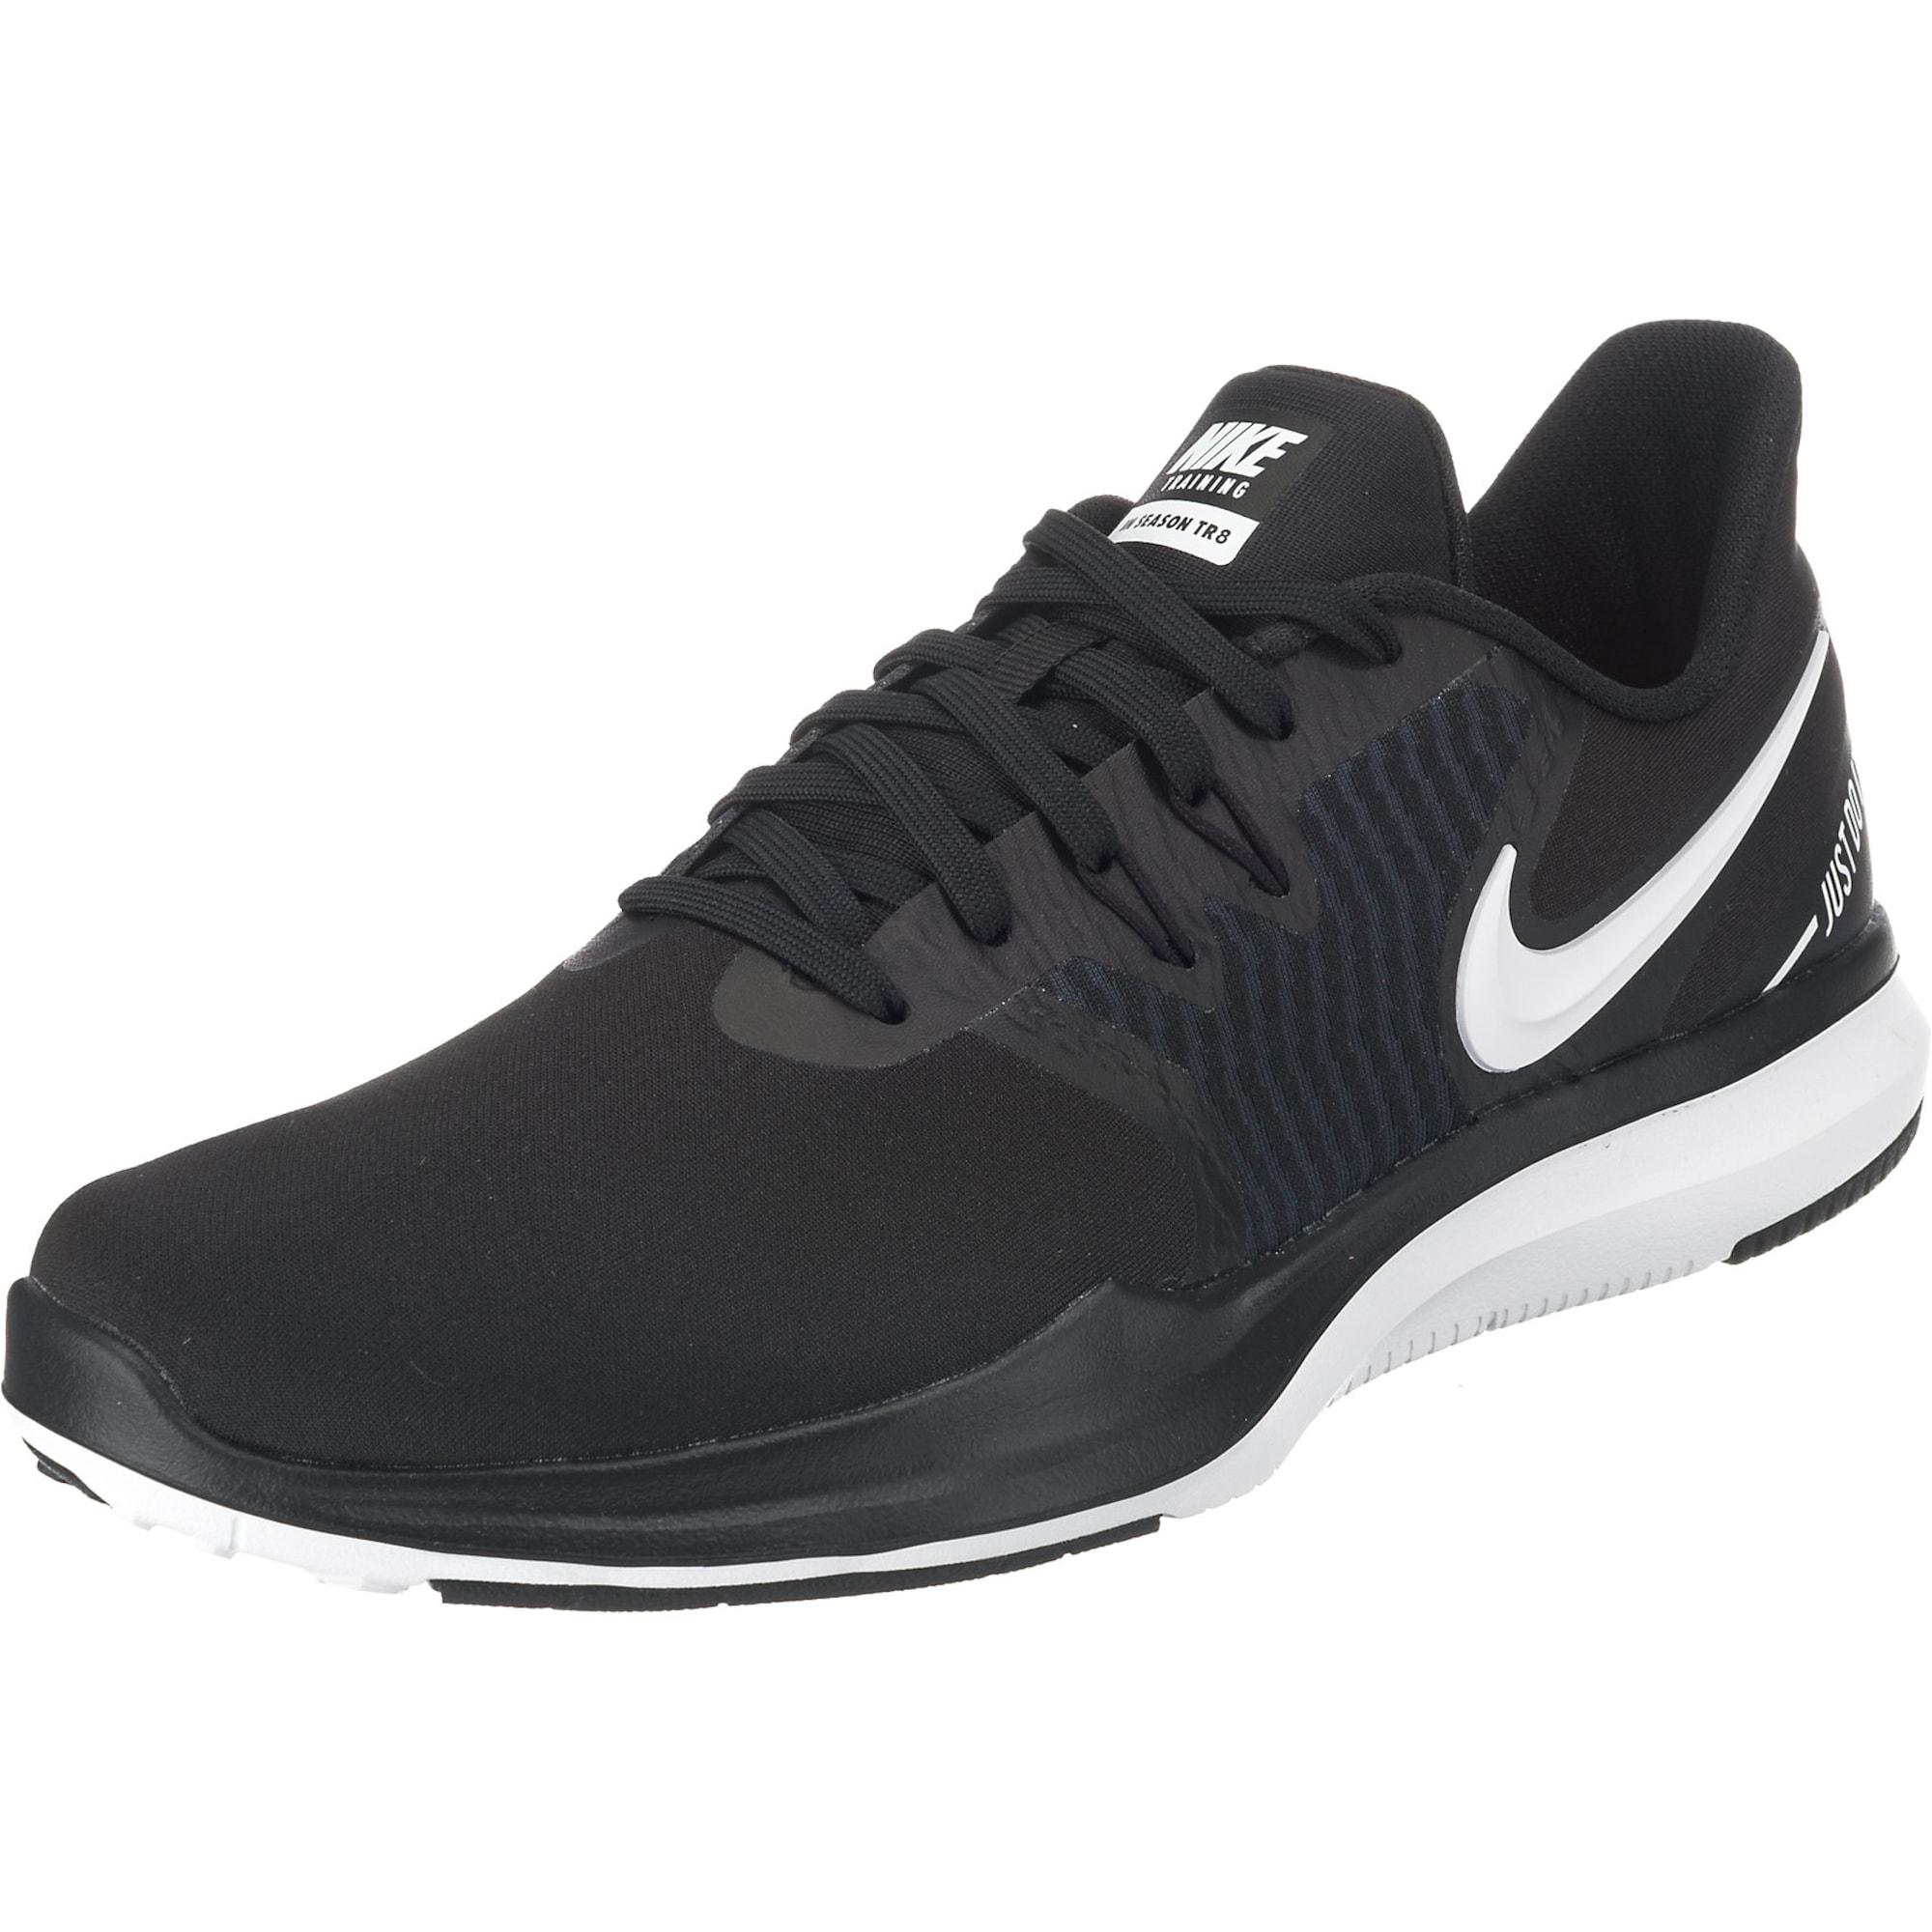 Sportovní boty In-Season Tr 8 černá bílá NIKE